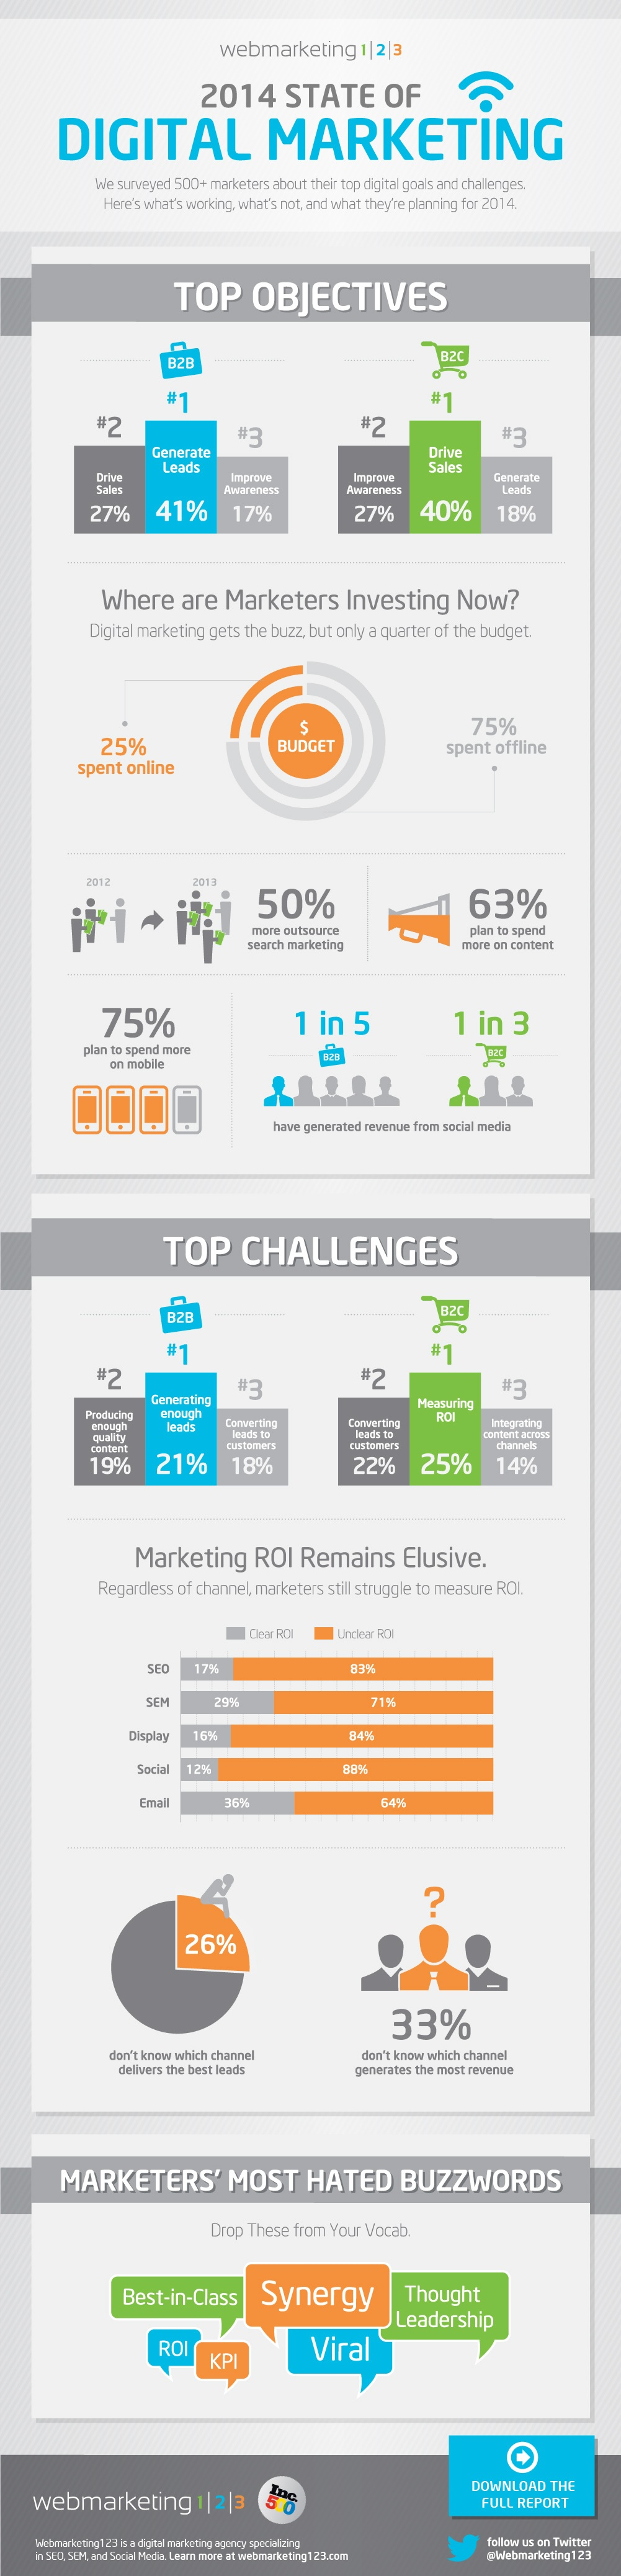 4.-2014-State-of-Digital-Marketing